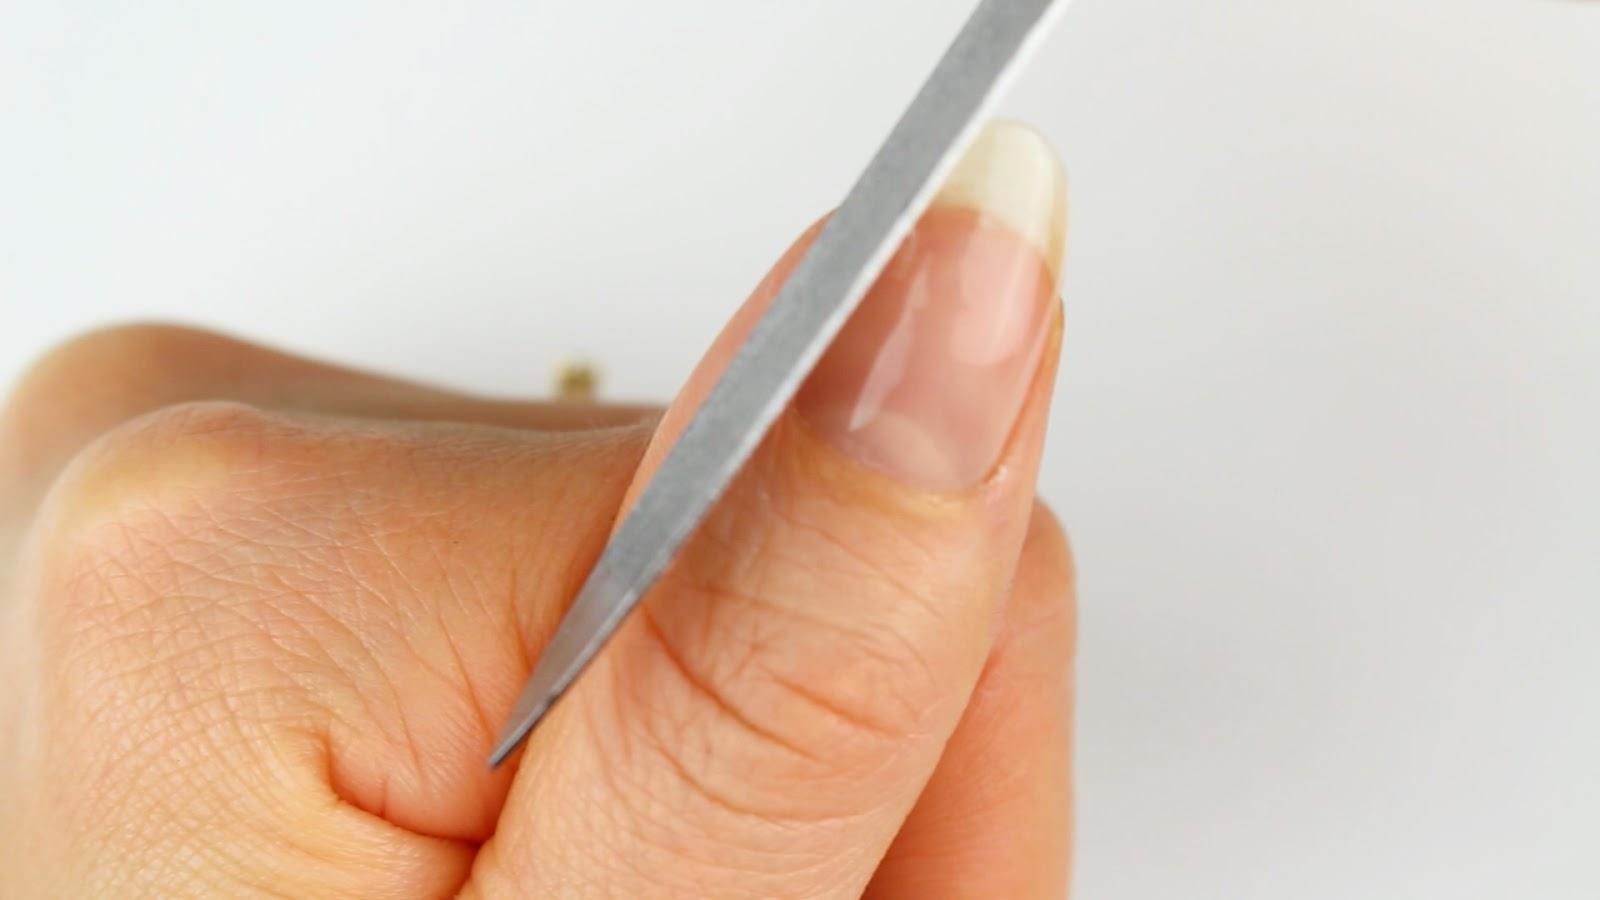 Eingerissenen Fingernagel feilen